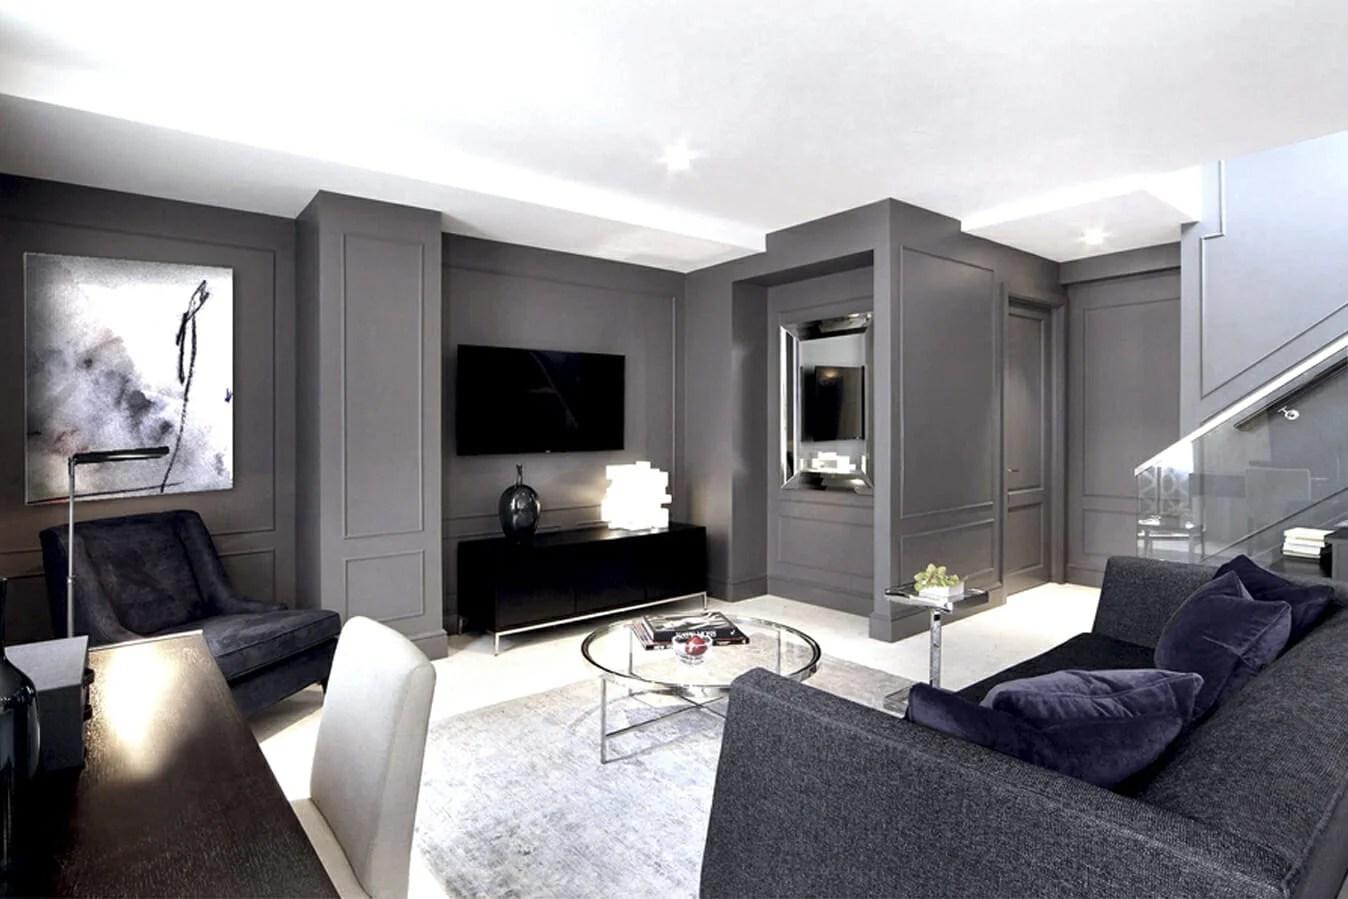 Modern Interior Design: 10 Best Tips for Creating ... on Interior Modern House  id=84366